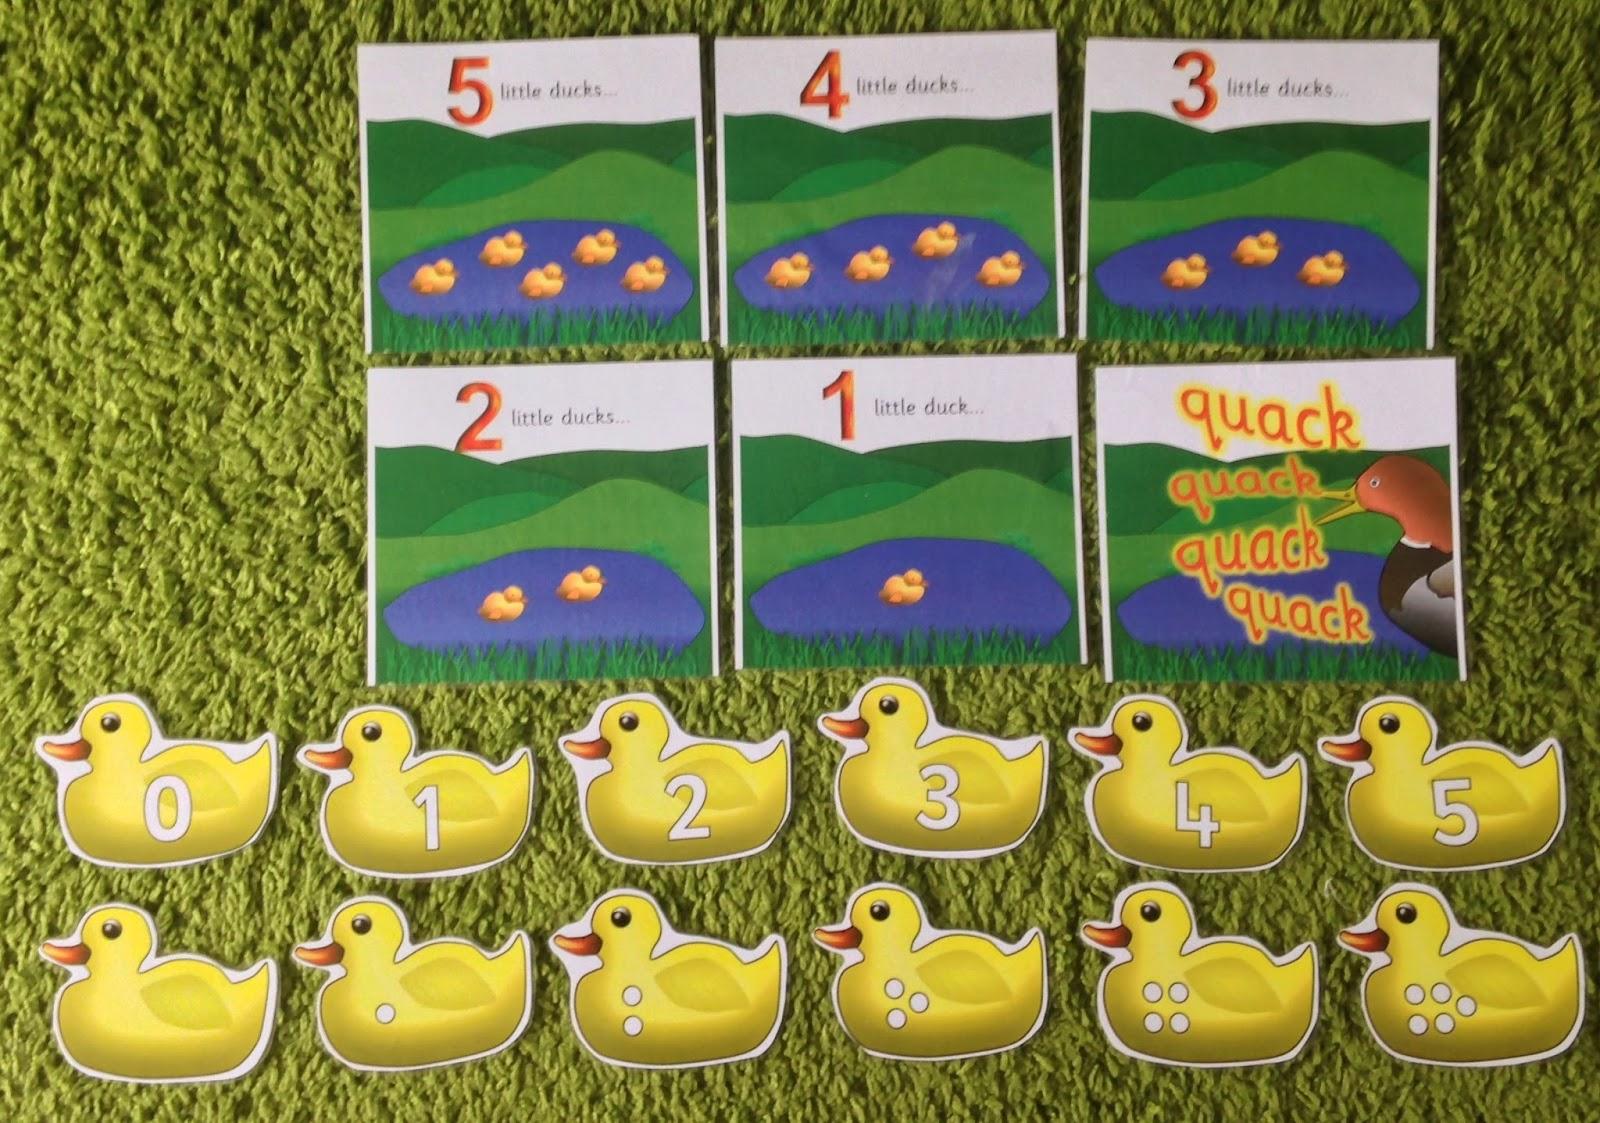 Early Language Skills Through Play 5 Little Ducks